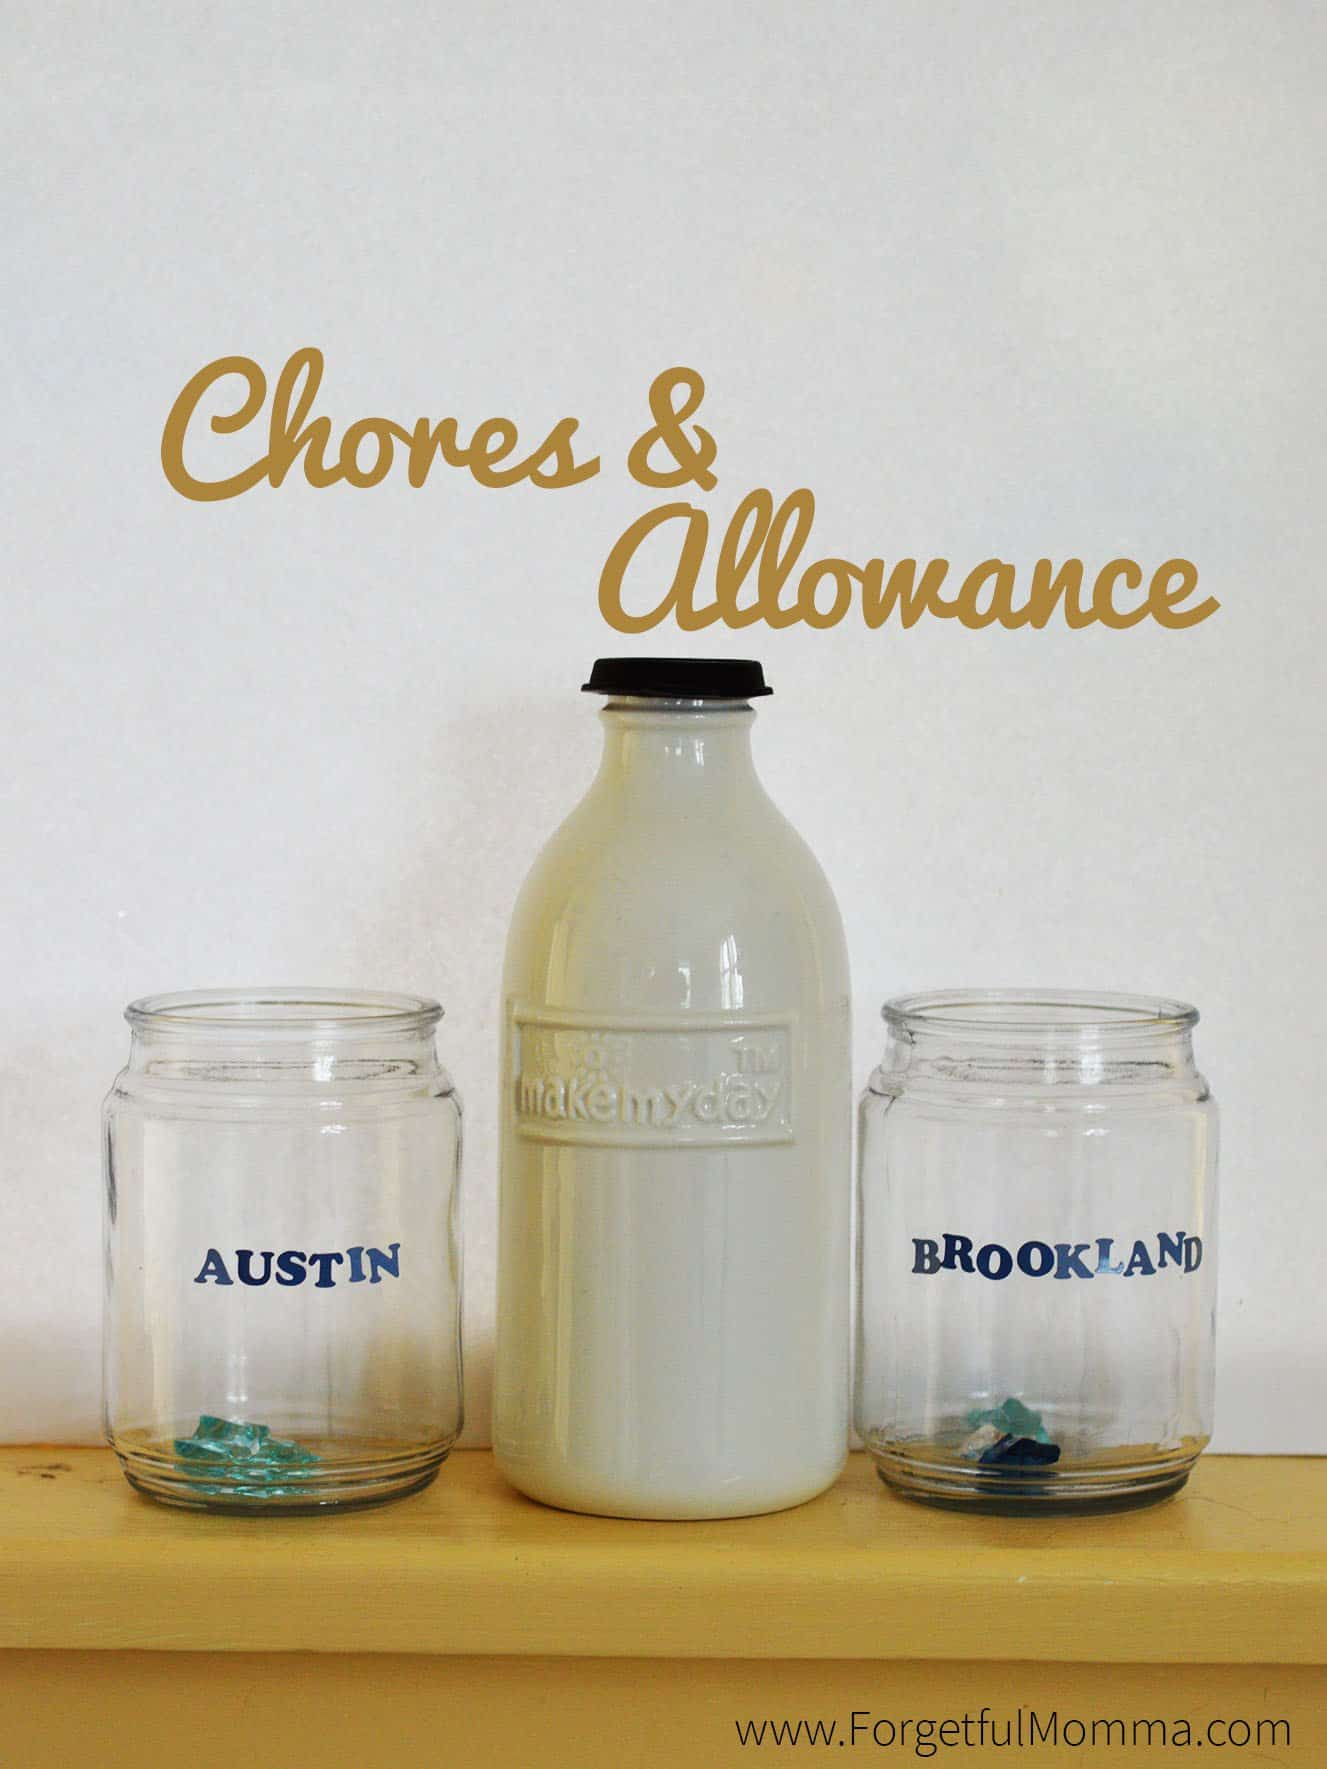 chores & allowance for children